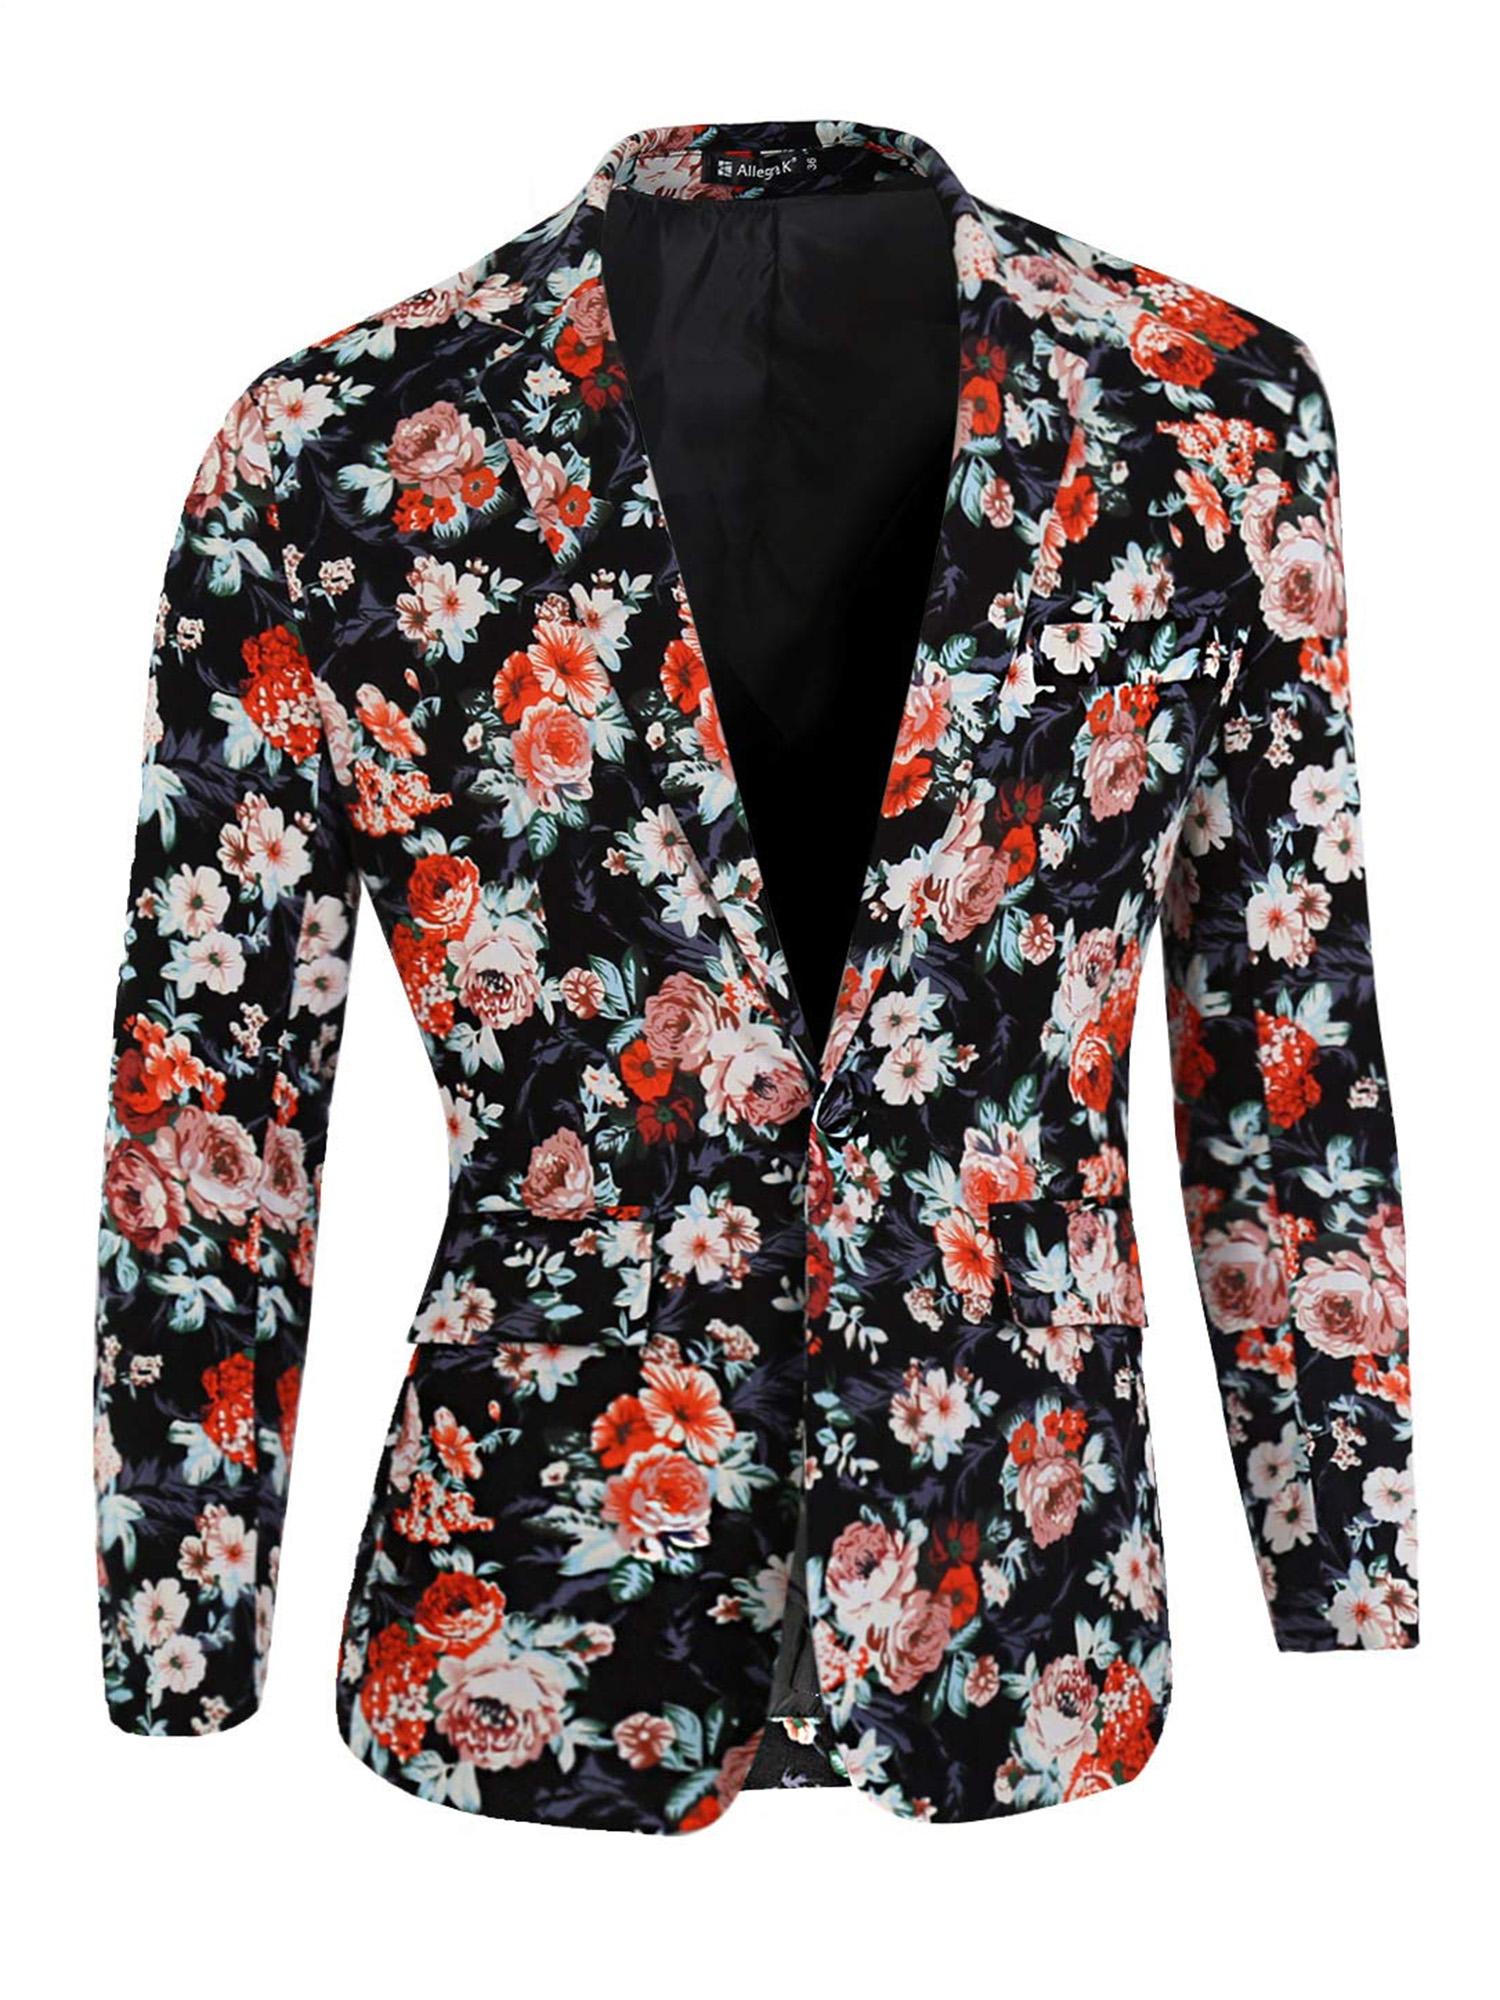 Men's Prom Floral Slim Fit Suit Blazer Jacket Black Coral Pale Pink 40